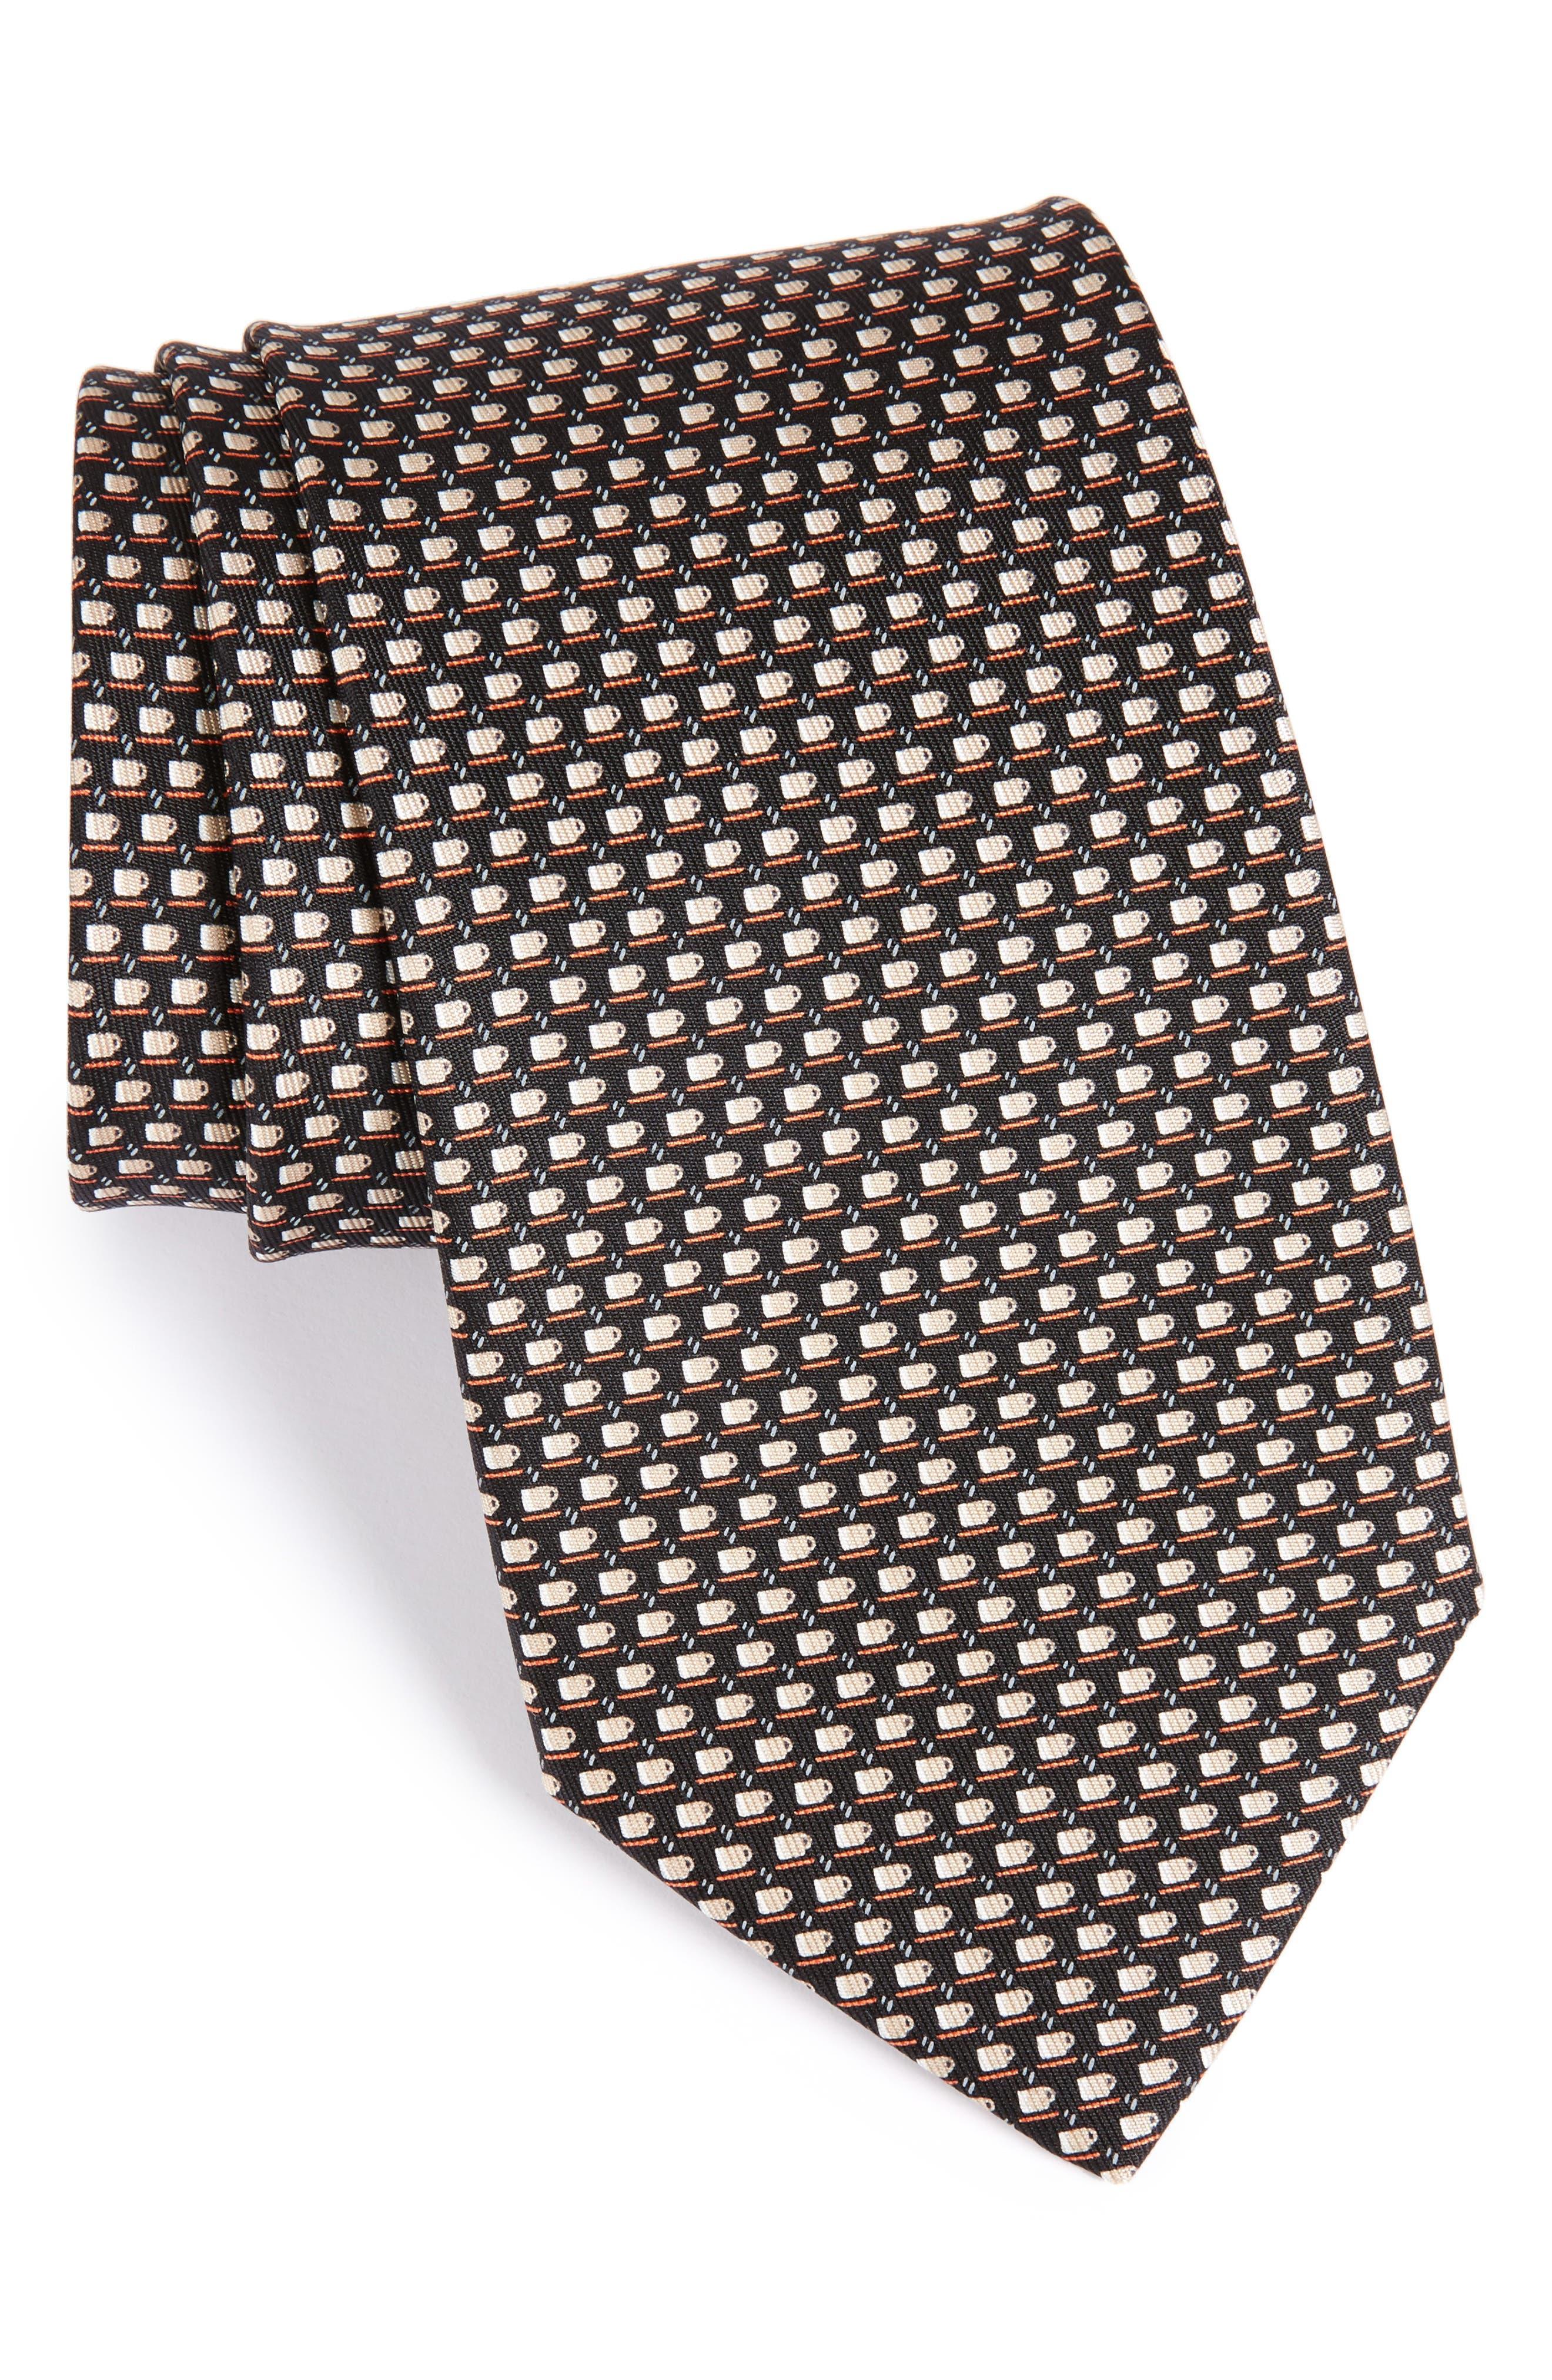 Alternate Image 1 Selected - Salvatore Ferragamo Coffee Cup Print Silk Tie